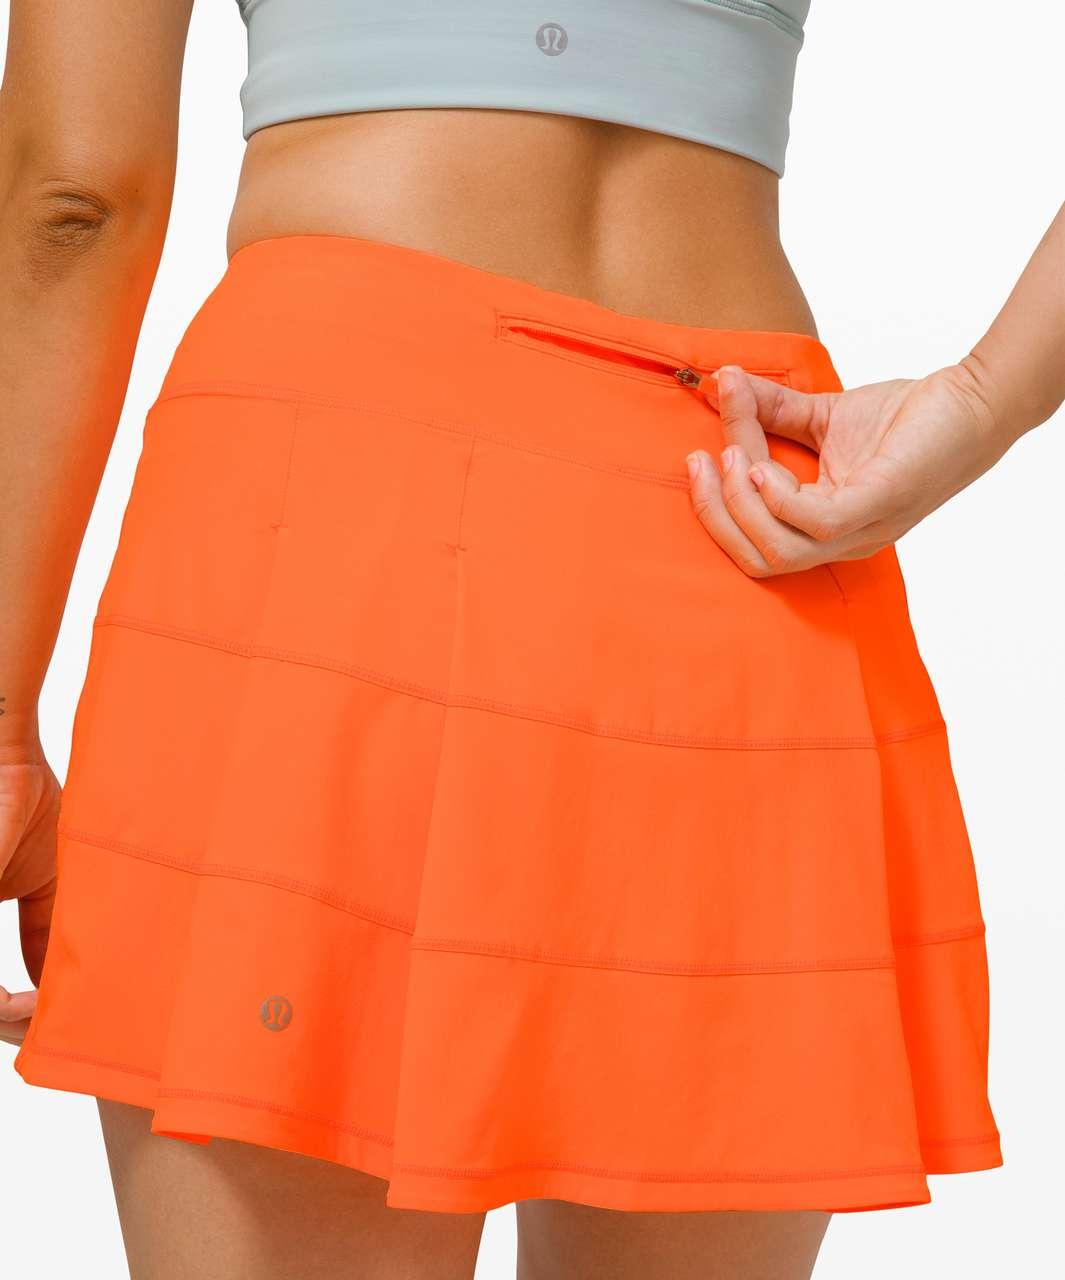 "Lululemon Pace Rival Skirt (Tall) *4-way Stretch 15"" - Highlight Orange"